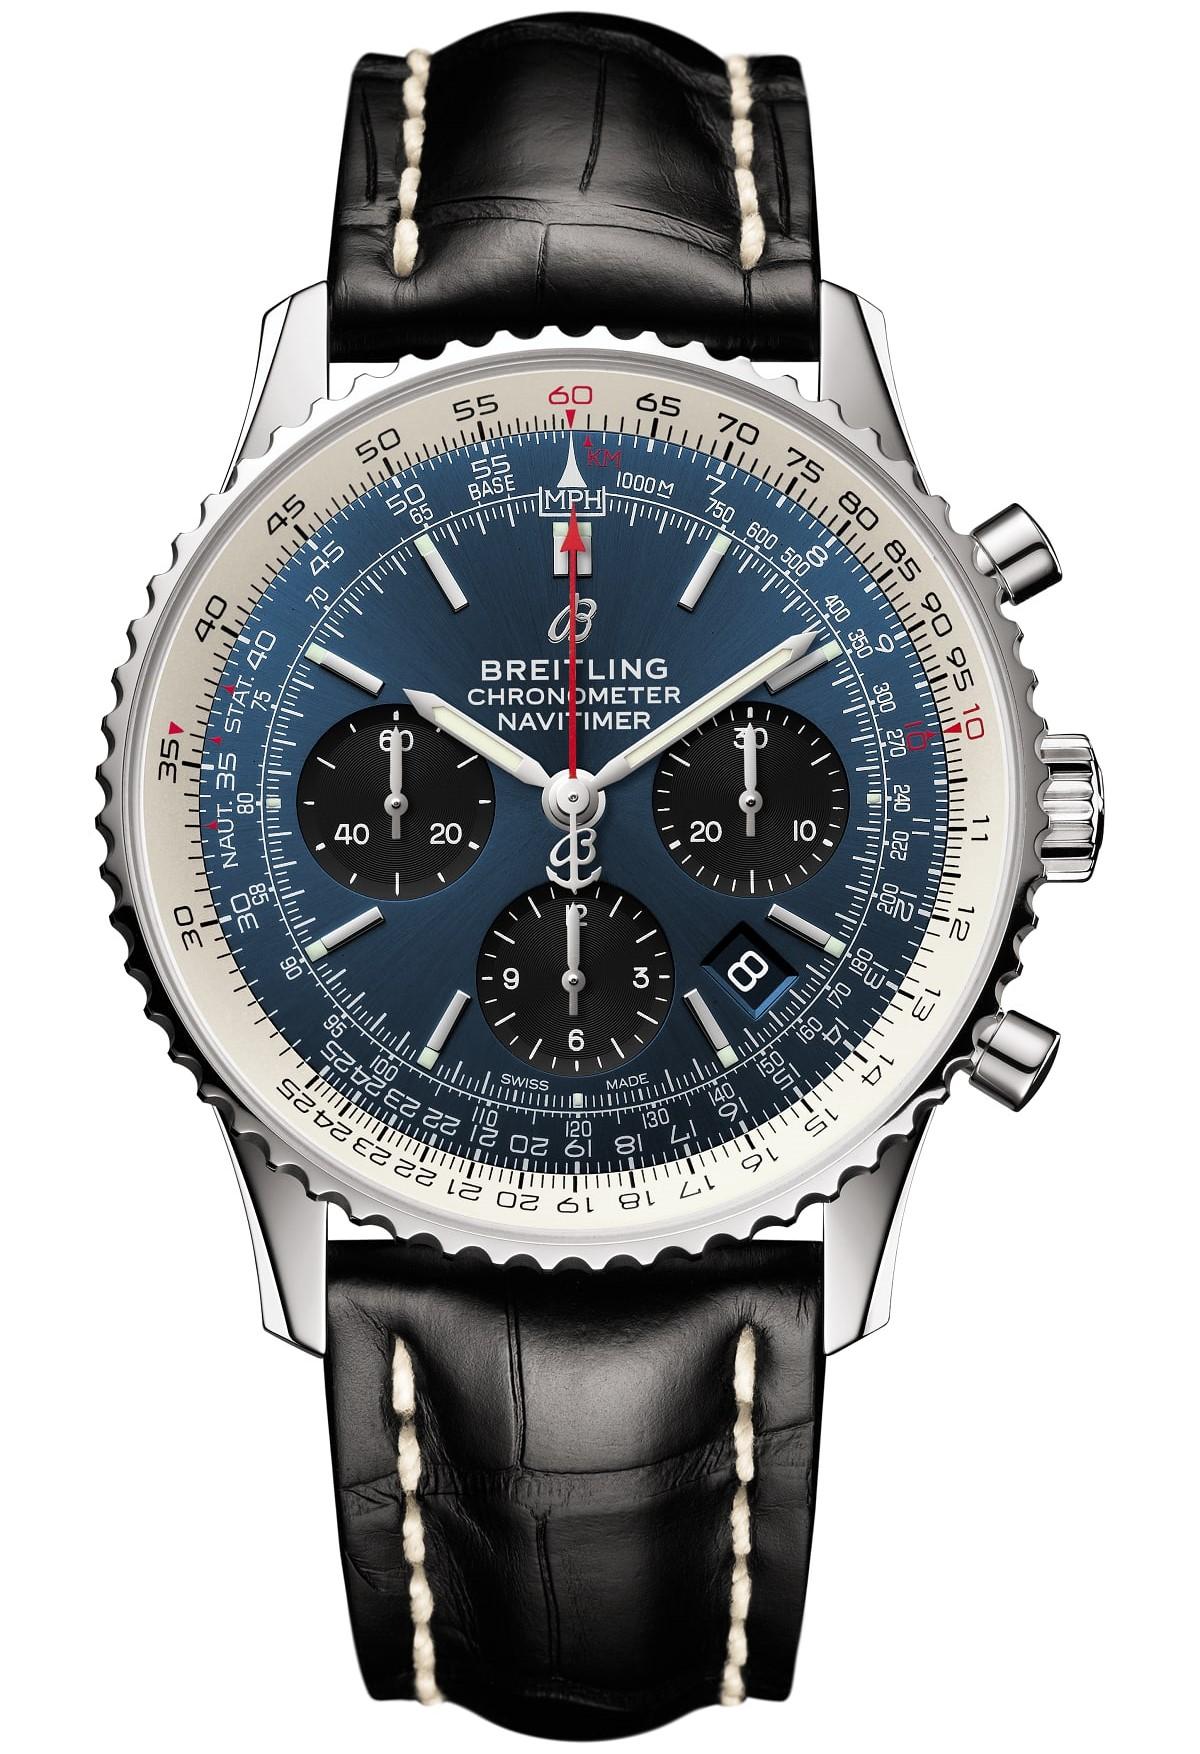 breitling-navitimer-1-b01-chronograph-watch-04.jpg